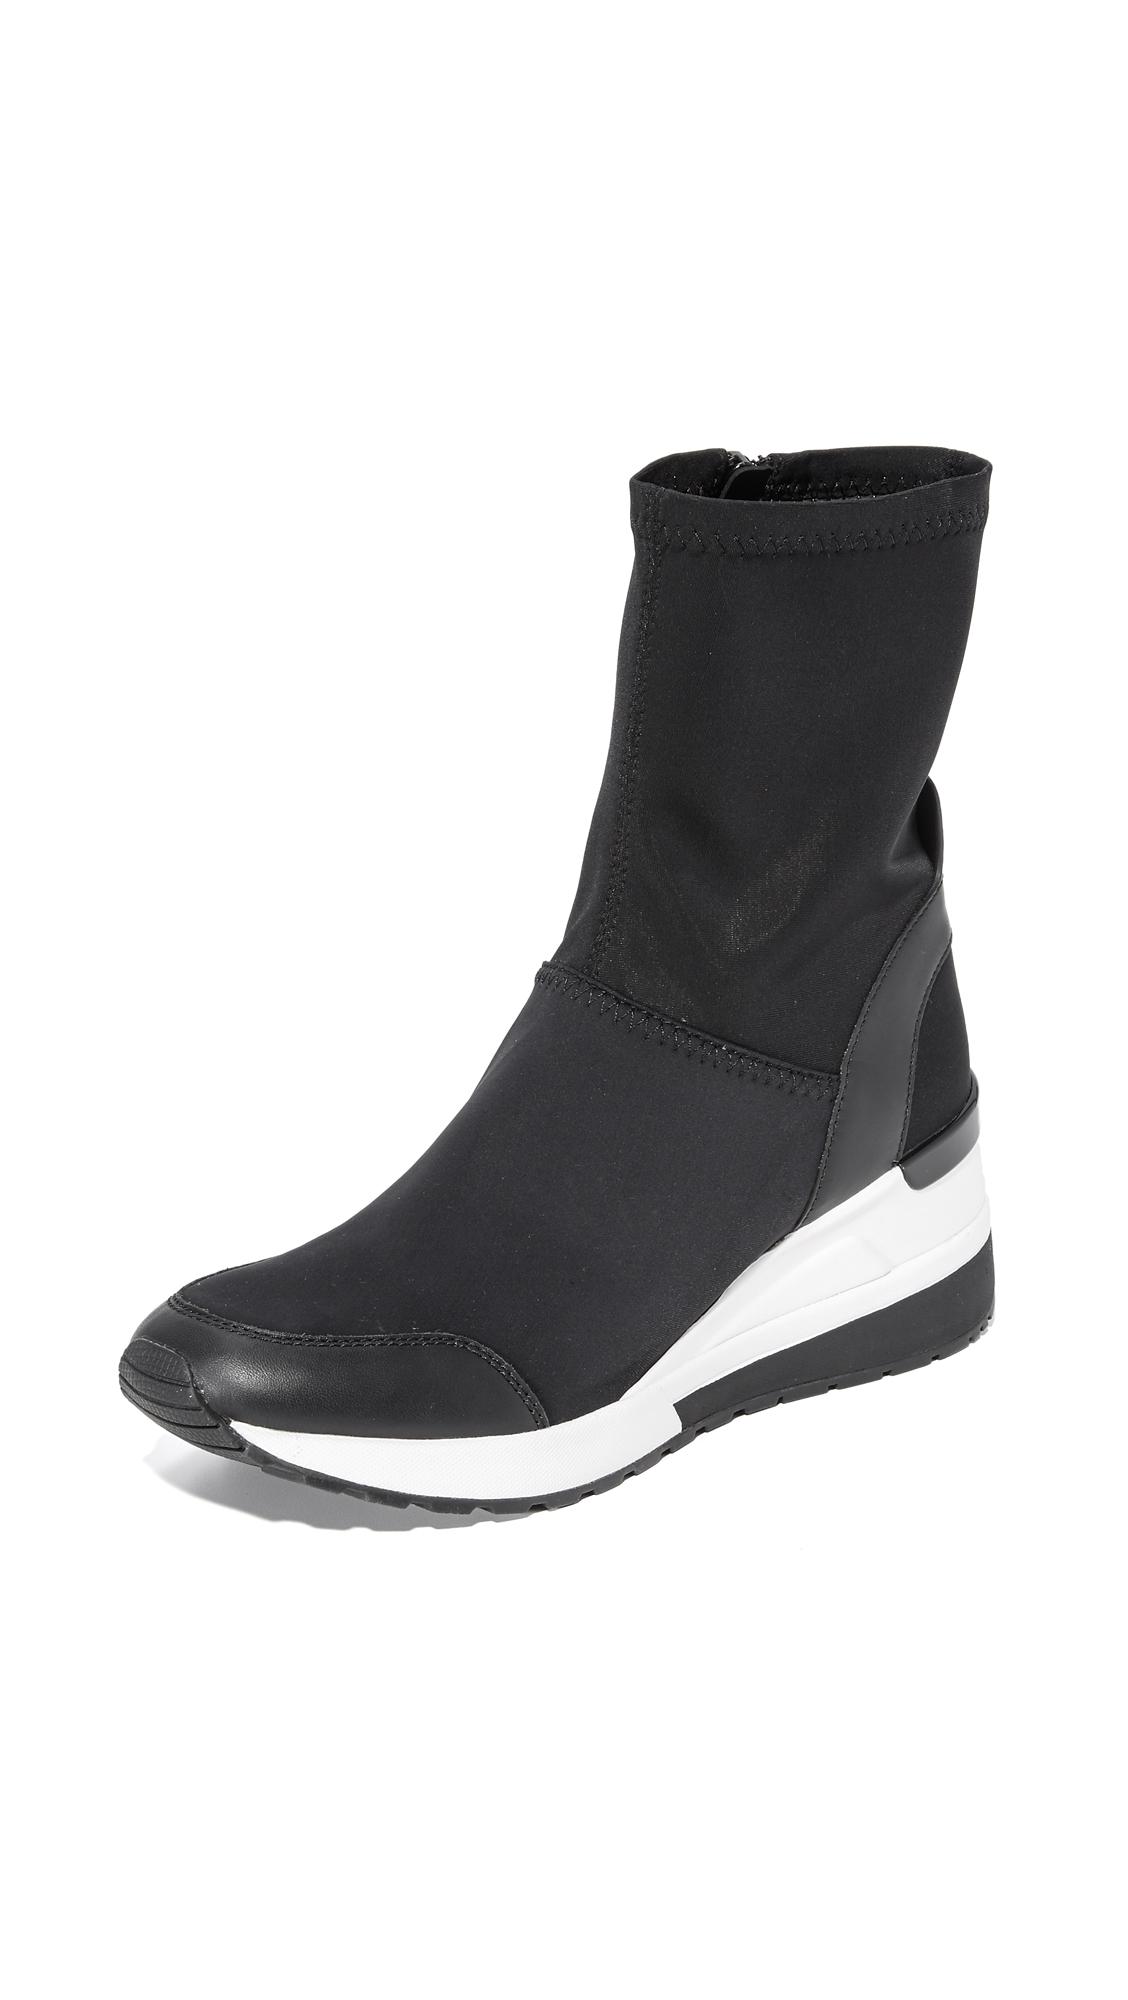 Michael Michael Kors Ace Sneaker Booties - Black